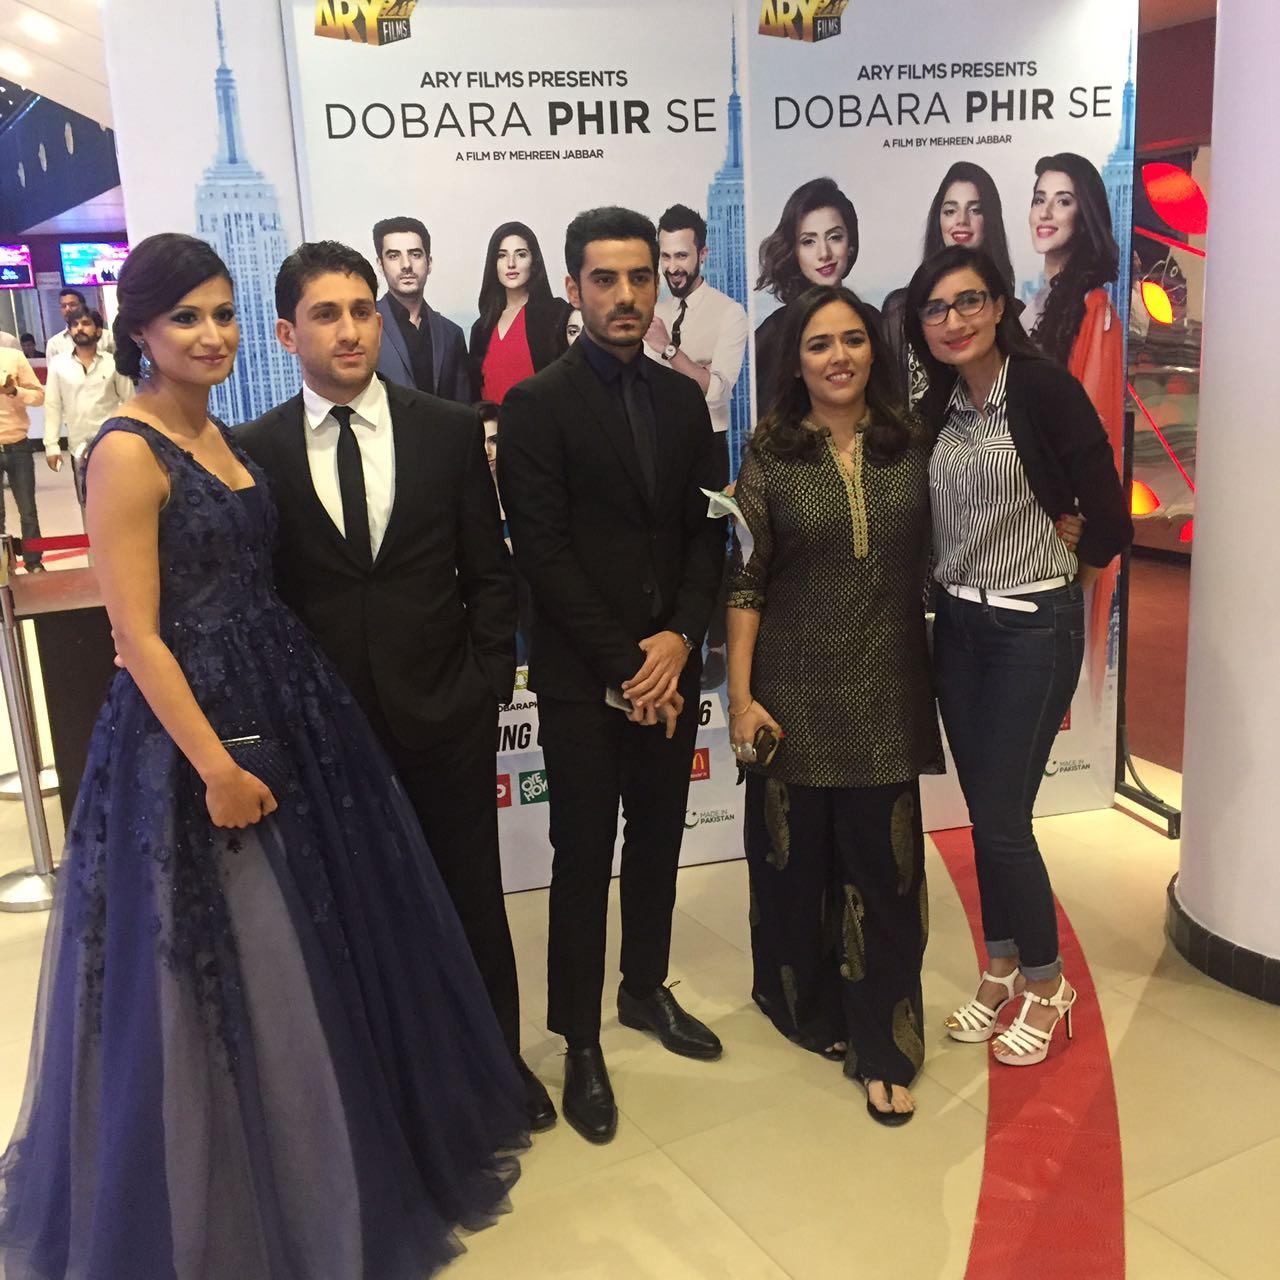 Team Of Dobara Phir Se At Karachi Premiere